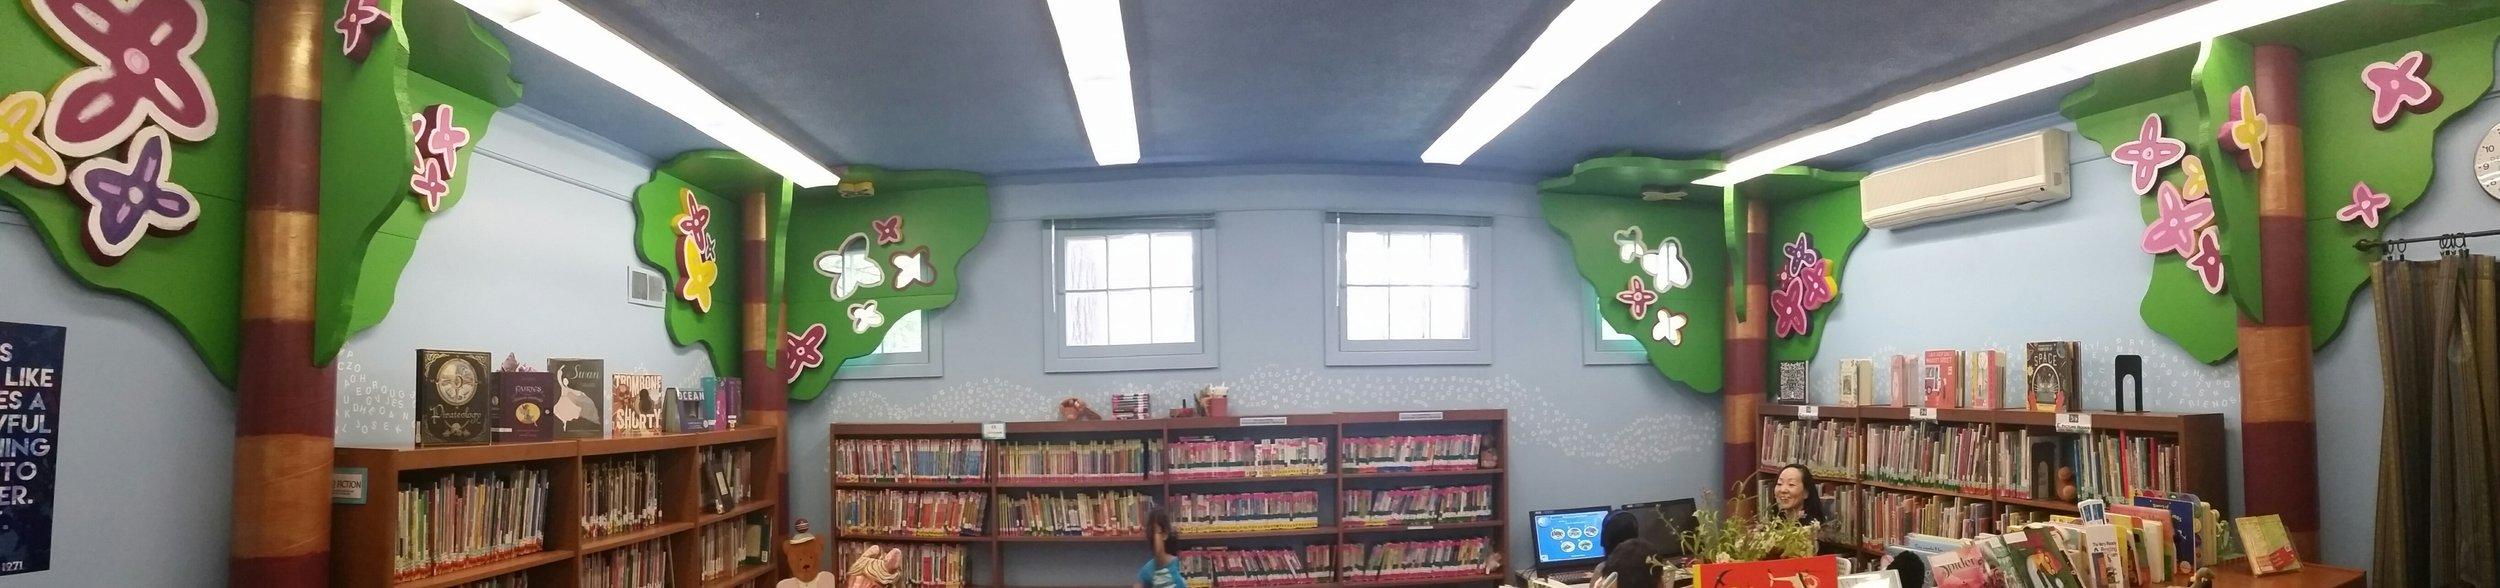 Woodstock Library Installation